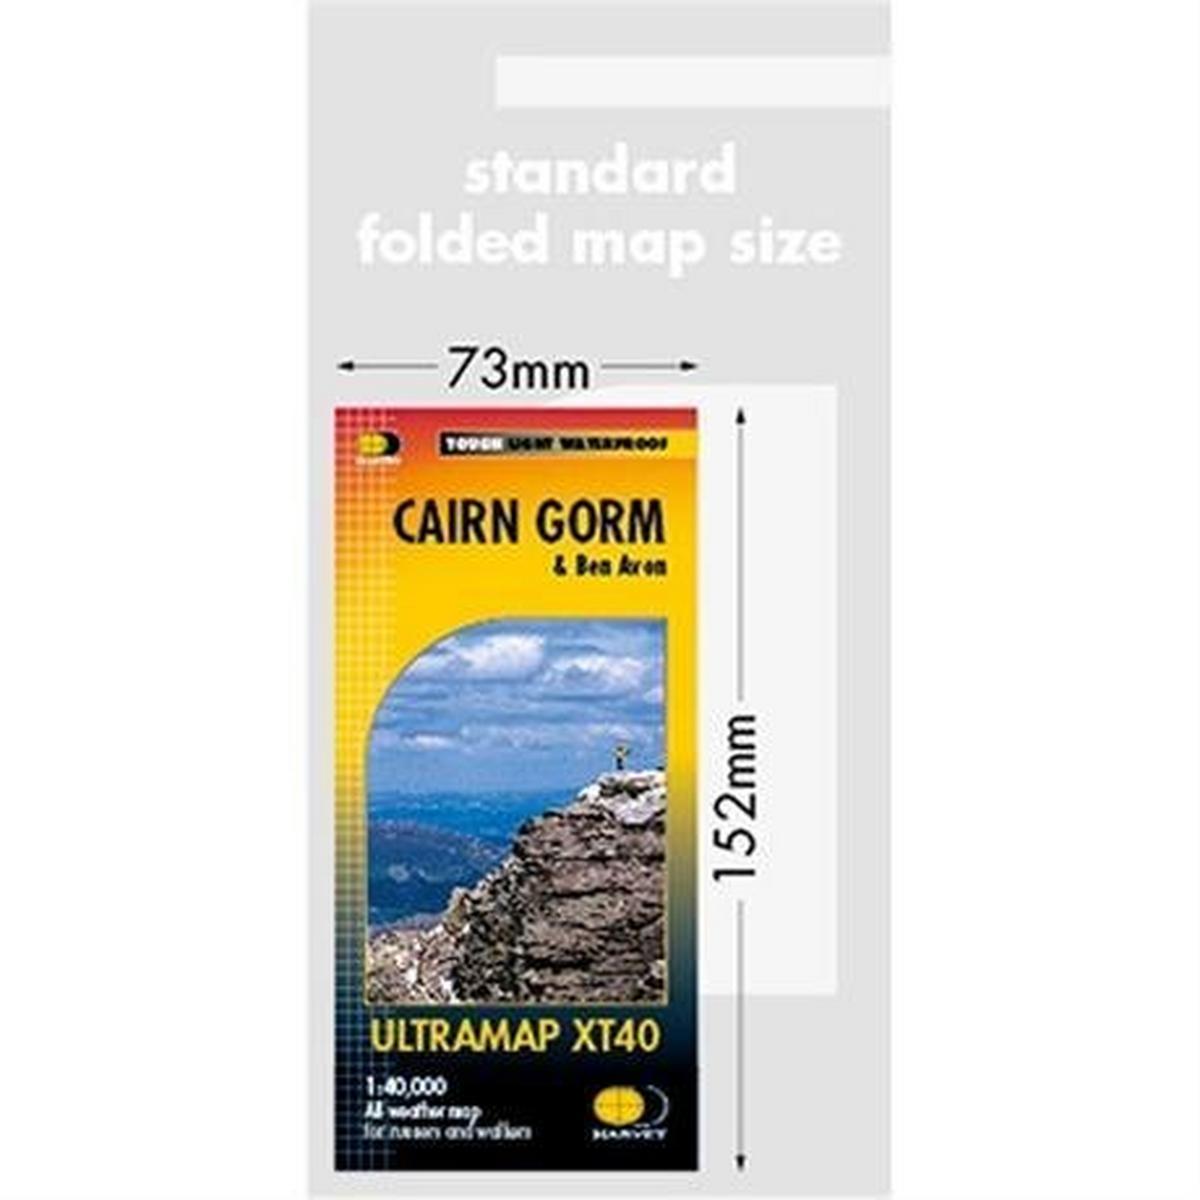 Harveys Harvey Ultramap XT40: Cairngorm and Ben Avon